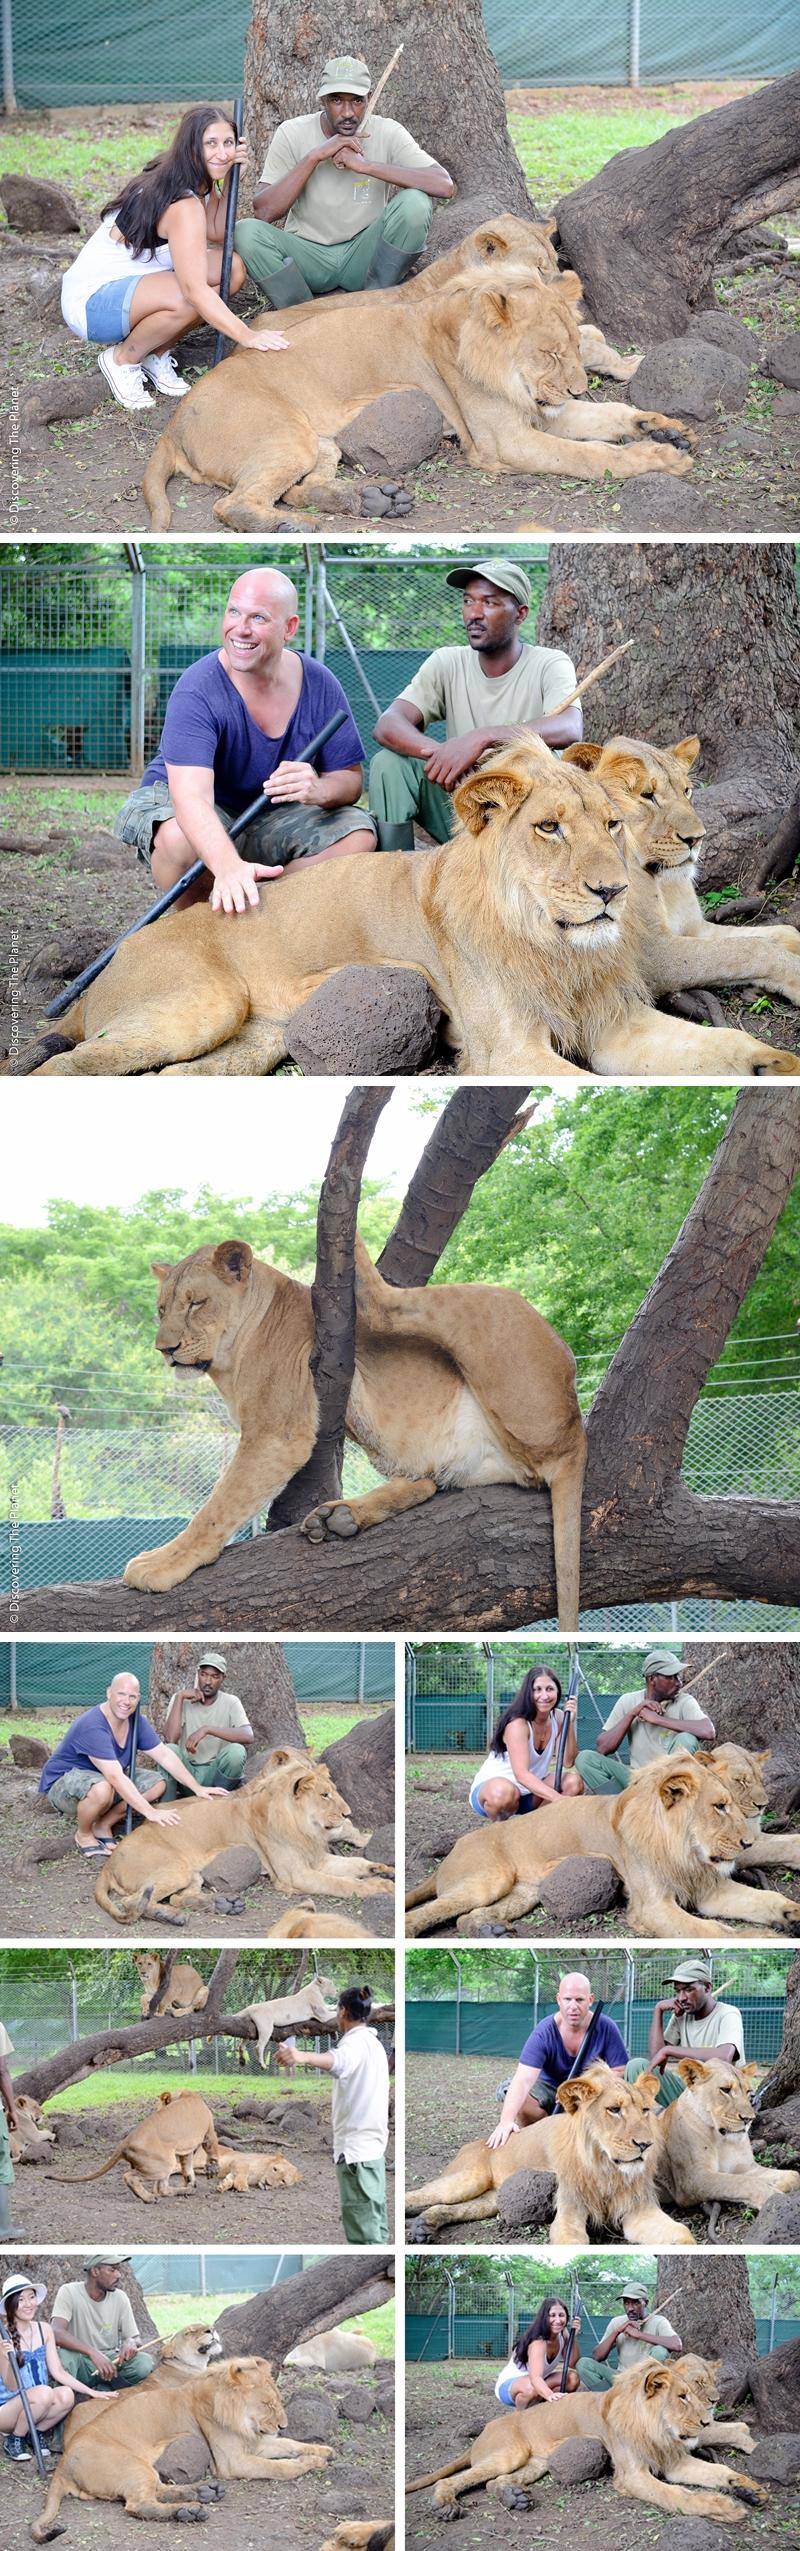 Lions in Mauritius by © Daniela Nasteska Olsson